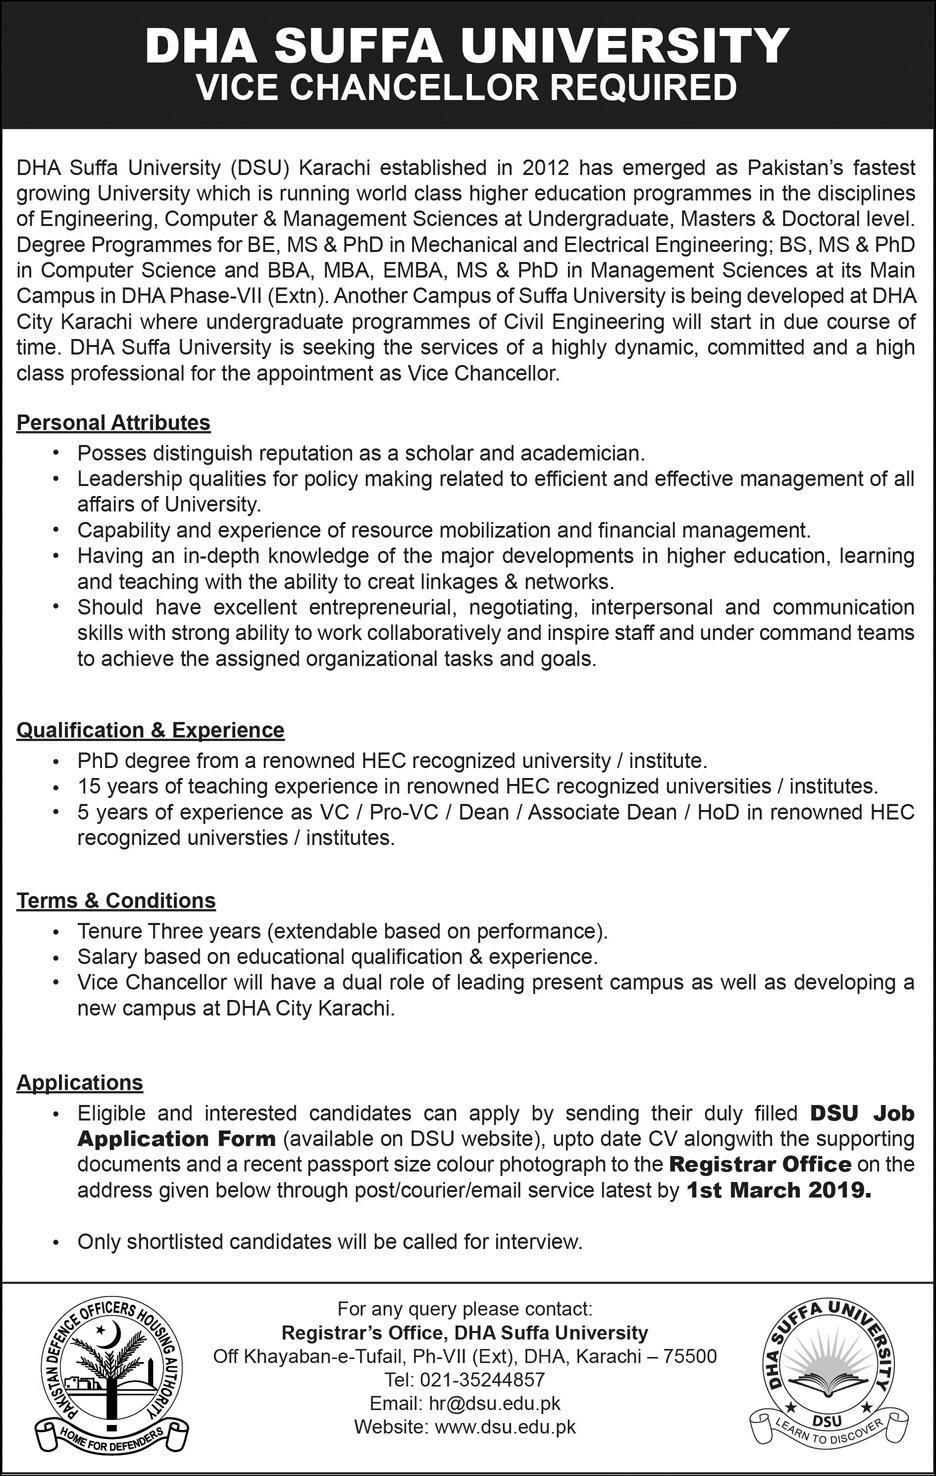 DHA Suffa University Vice Chancellor Jobs 2019